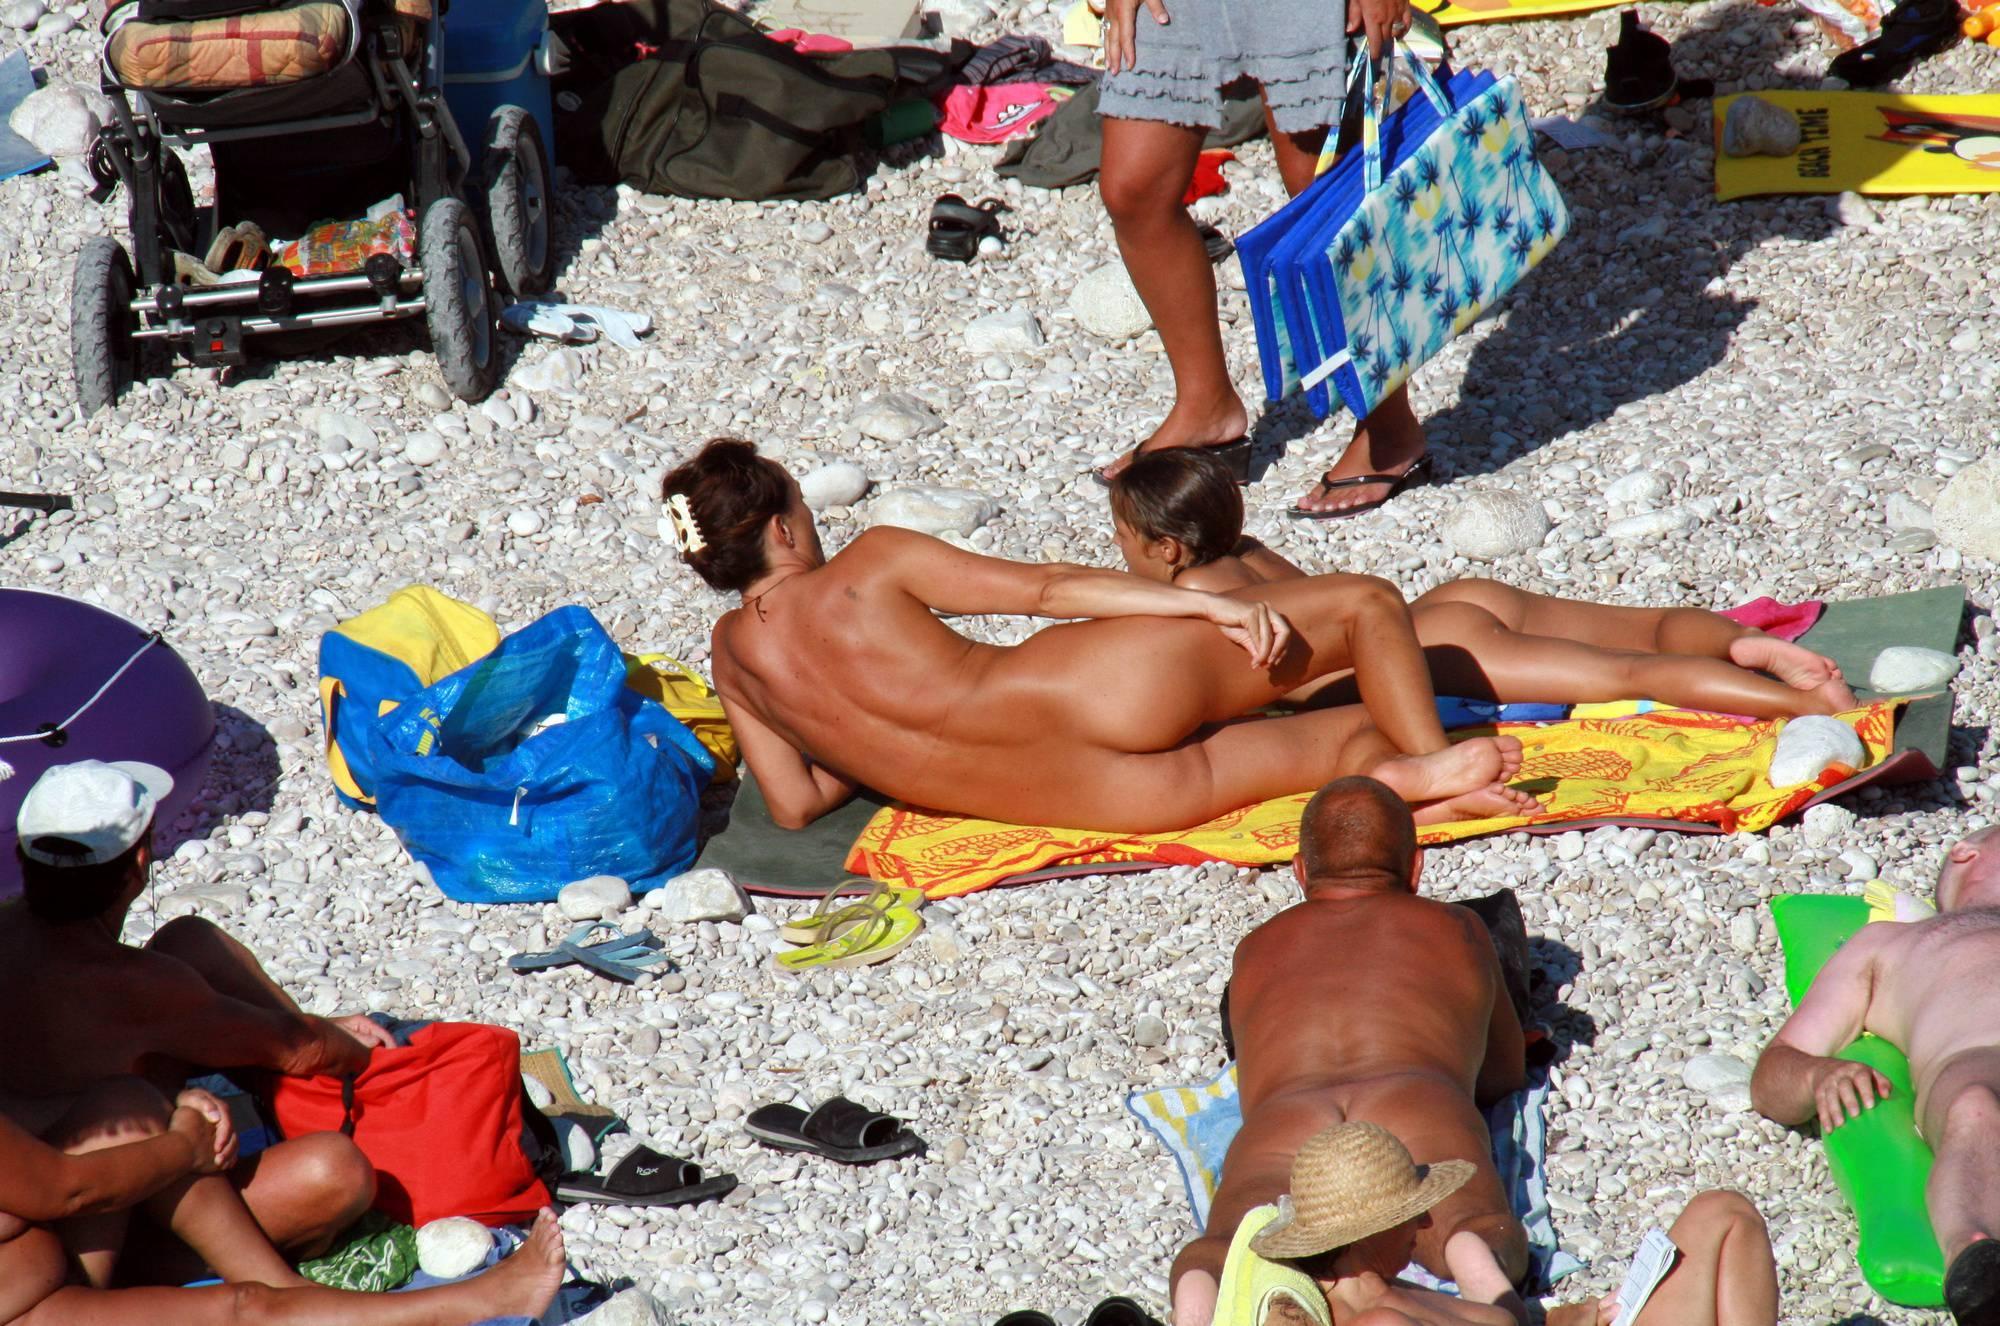 Purenudism Images-Nudist Beach Assortment - 2